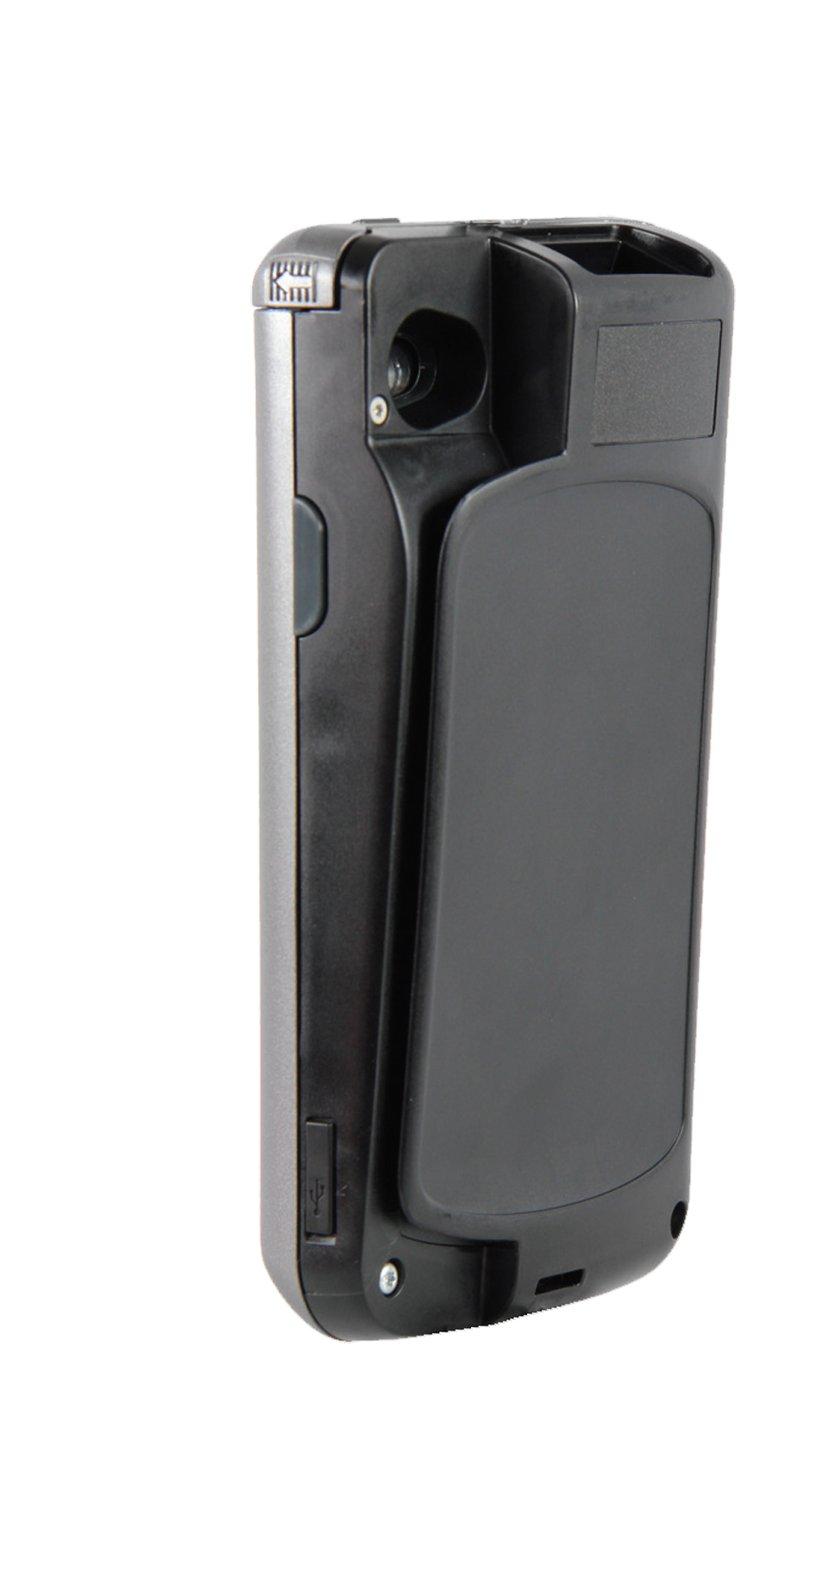 Honeywell Captuvo SL42 SLED USB SR - iPhone 5G